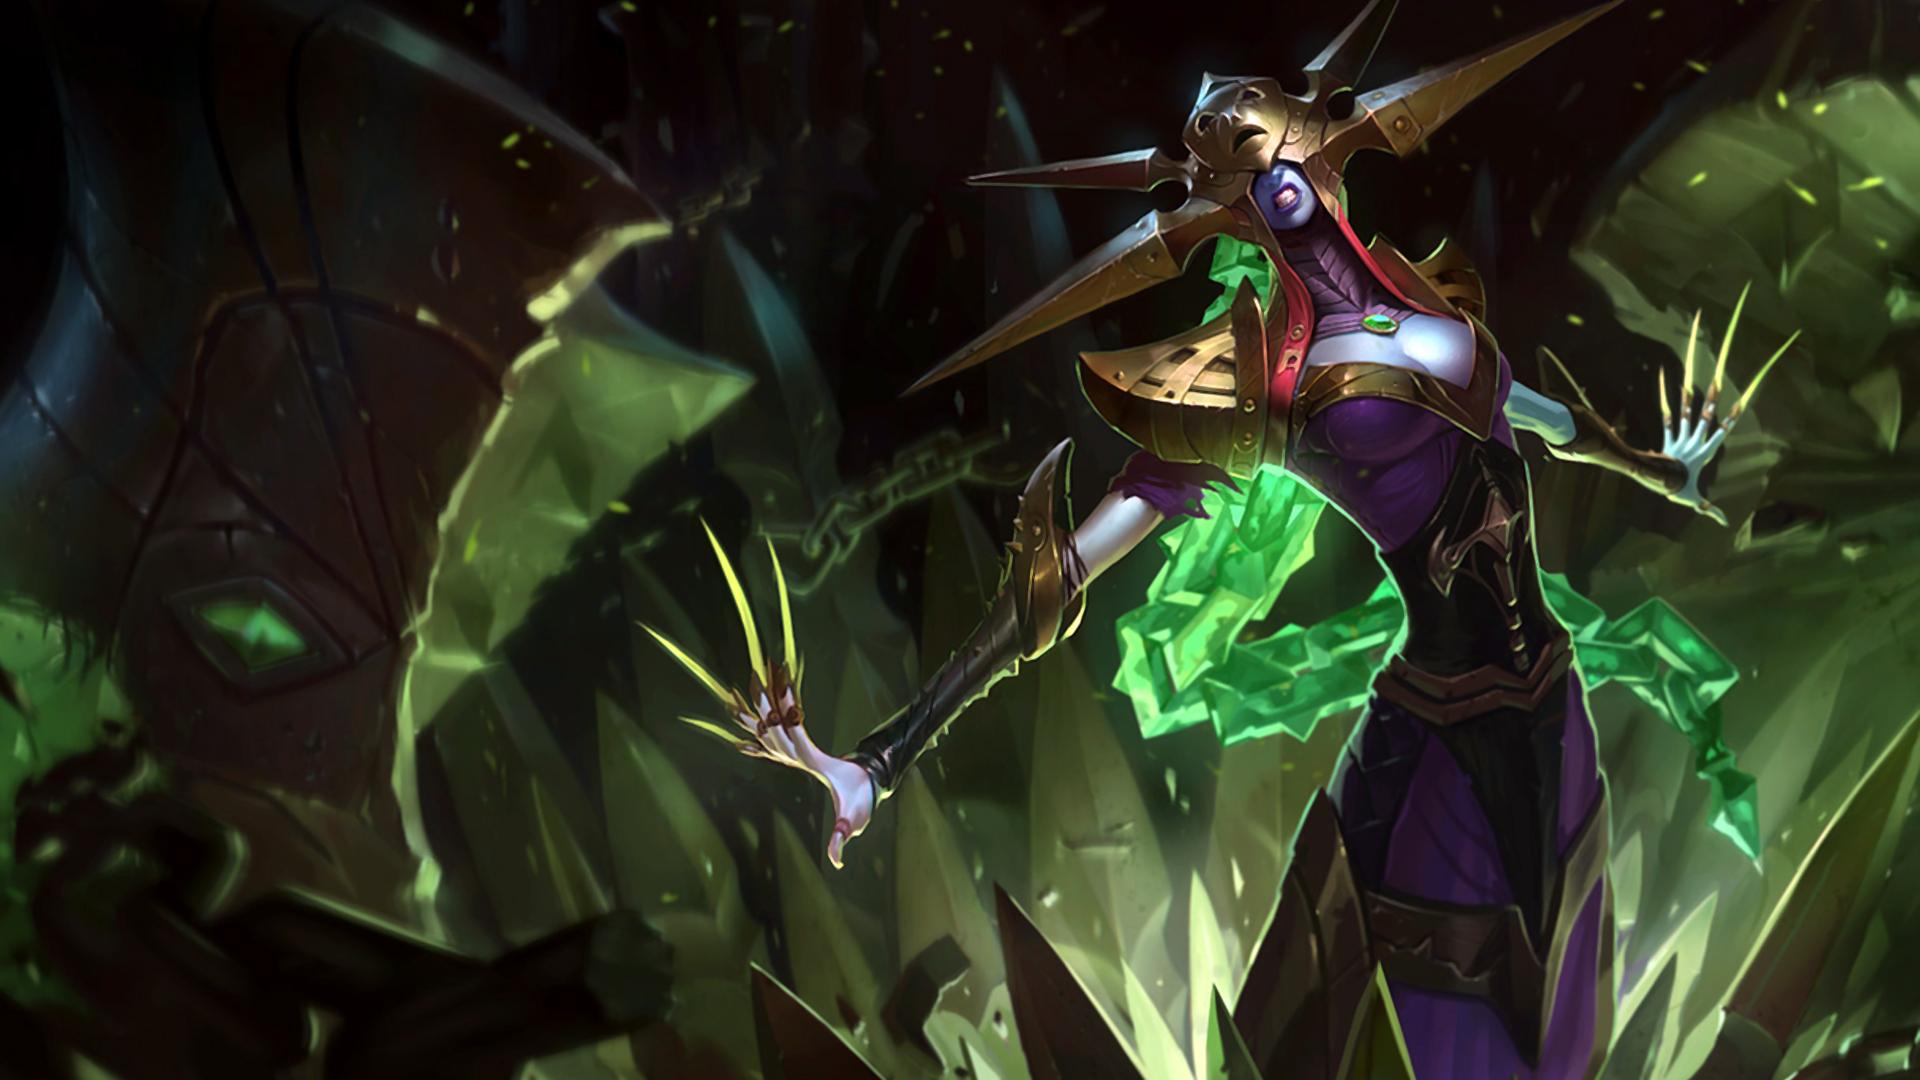 blade queen lissandra skin girl champion 1920x1080